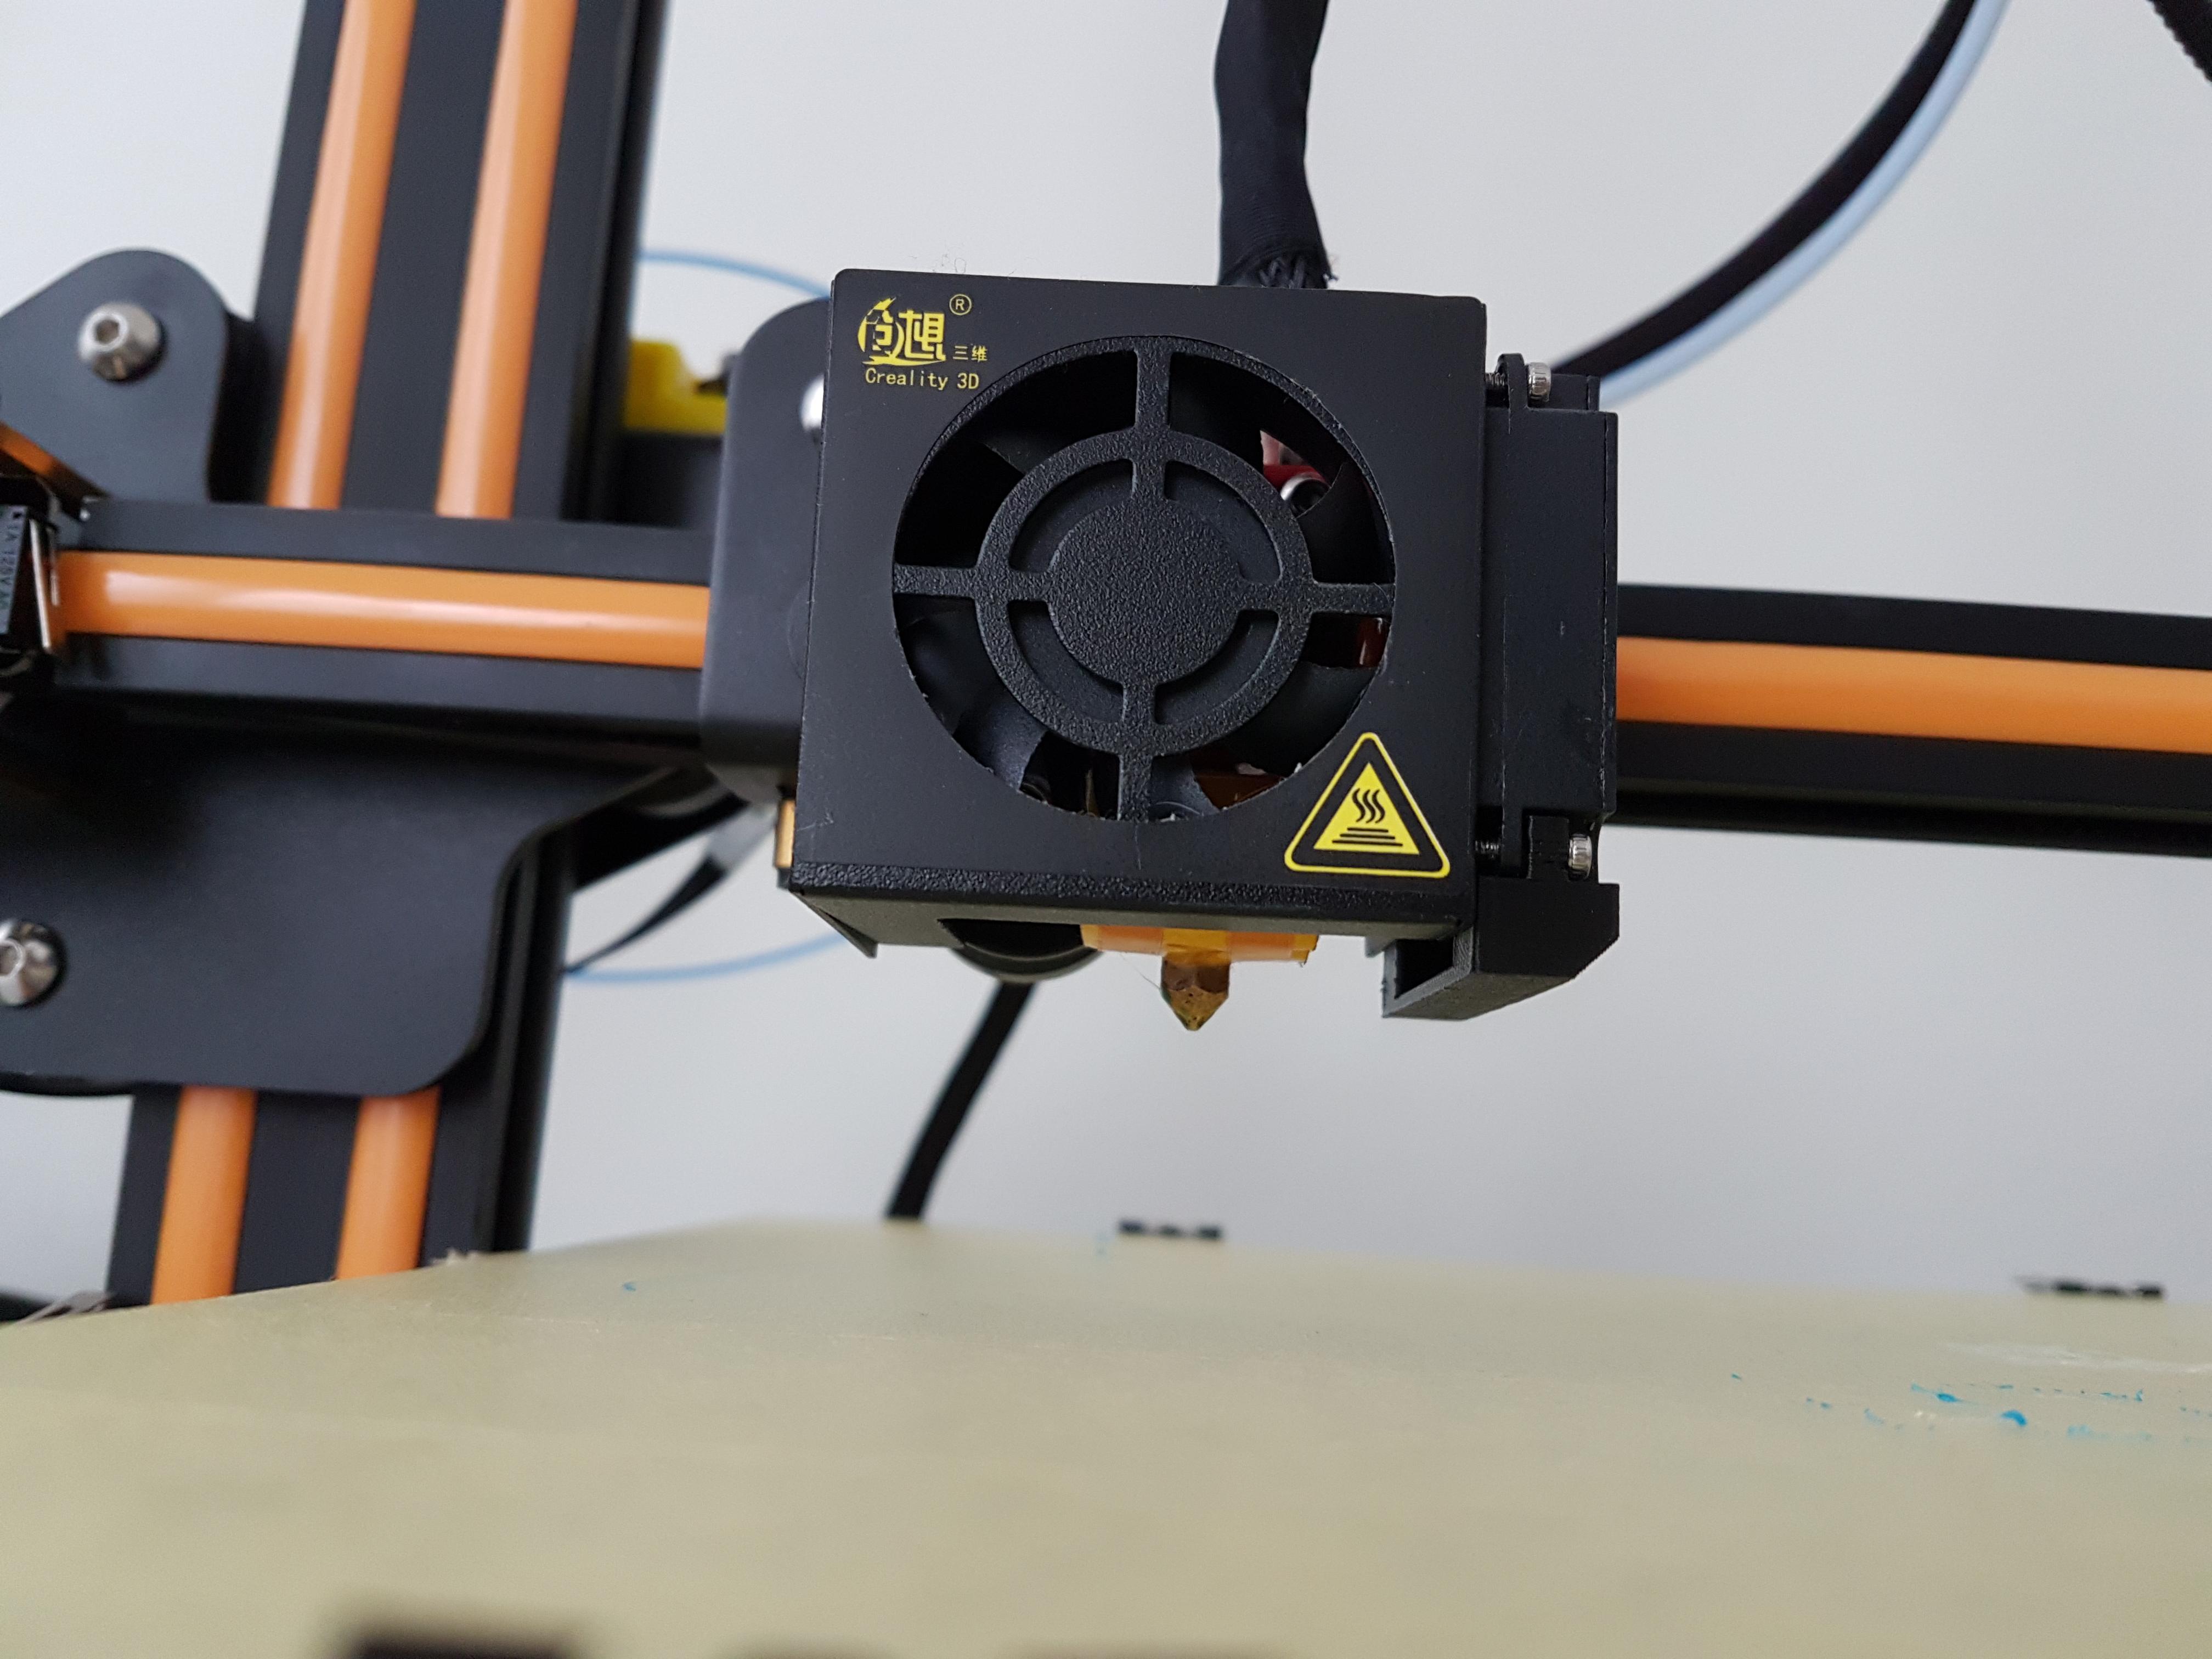 CR-10 duct fan mod by Nexi-Tech - Thingiverse